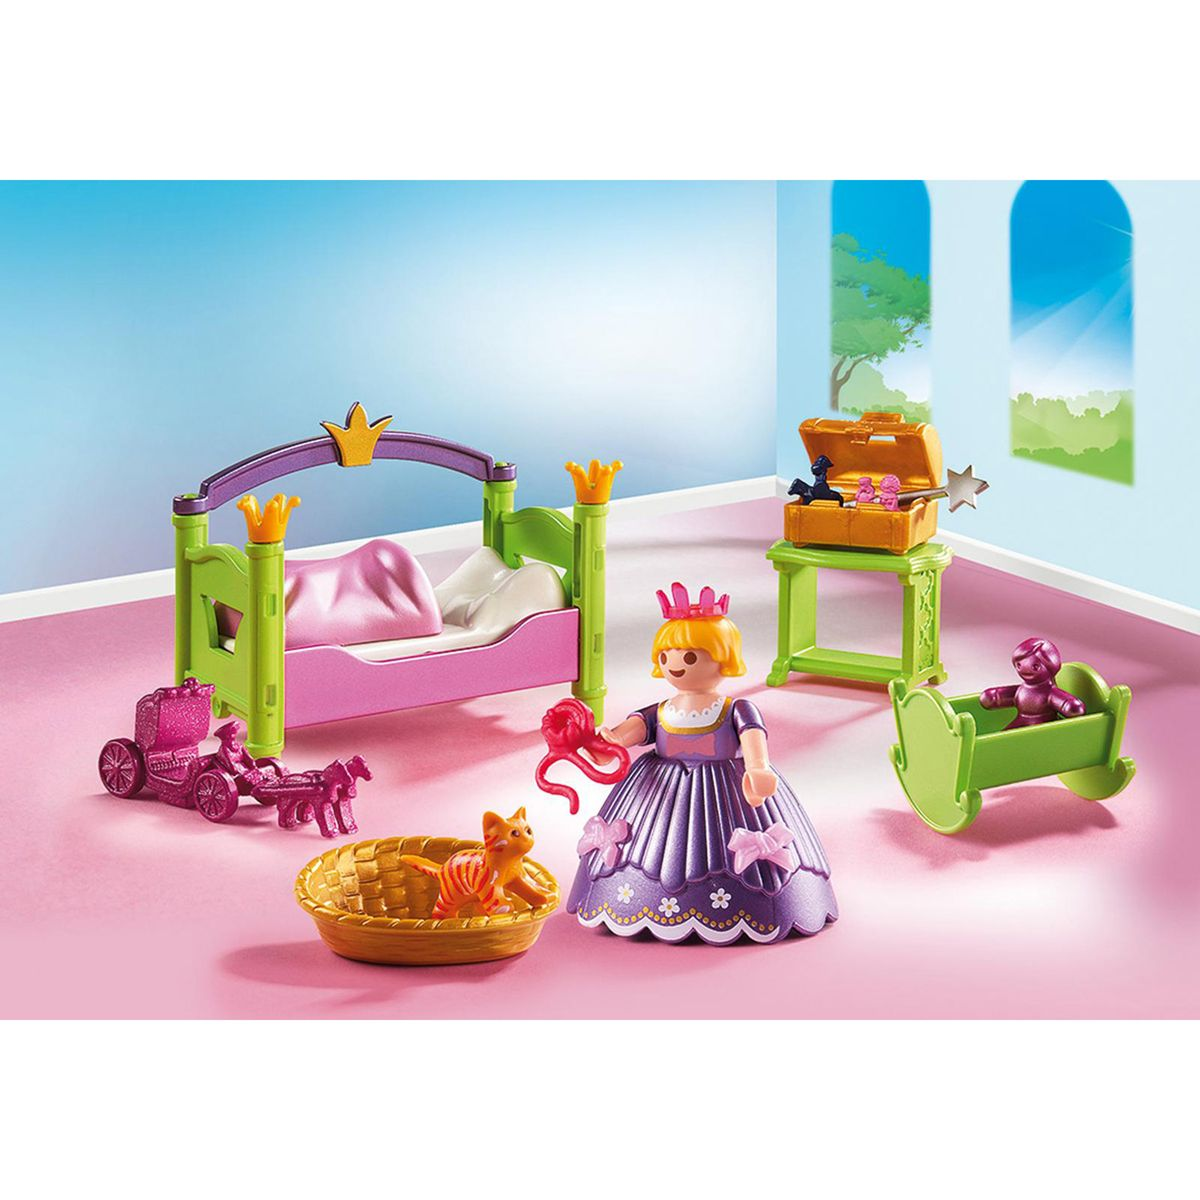 Chambre de princesse Playmobil Princess 6852 - Les ...